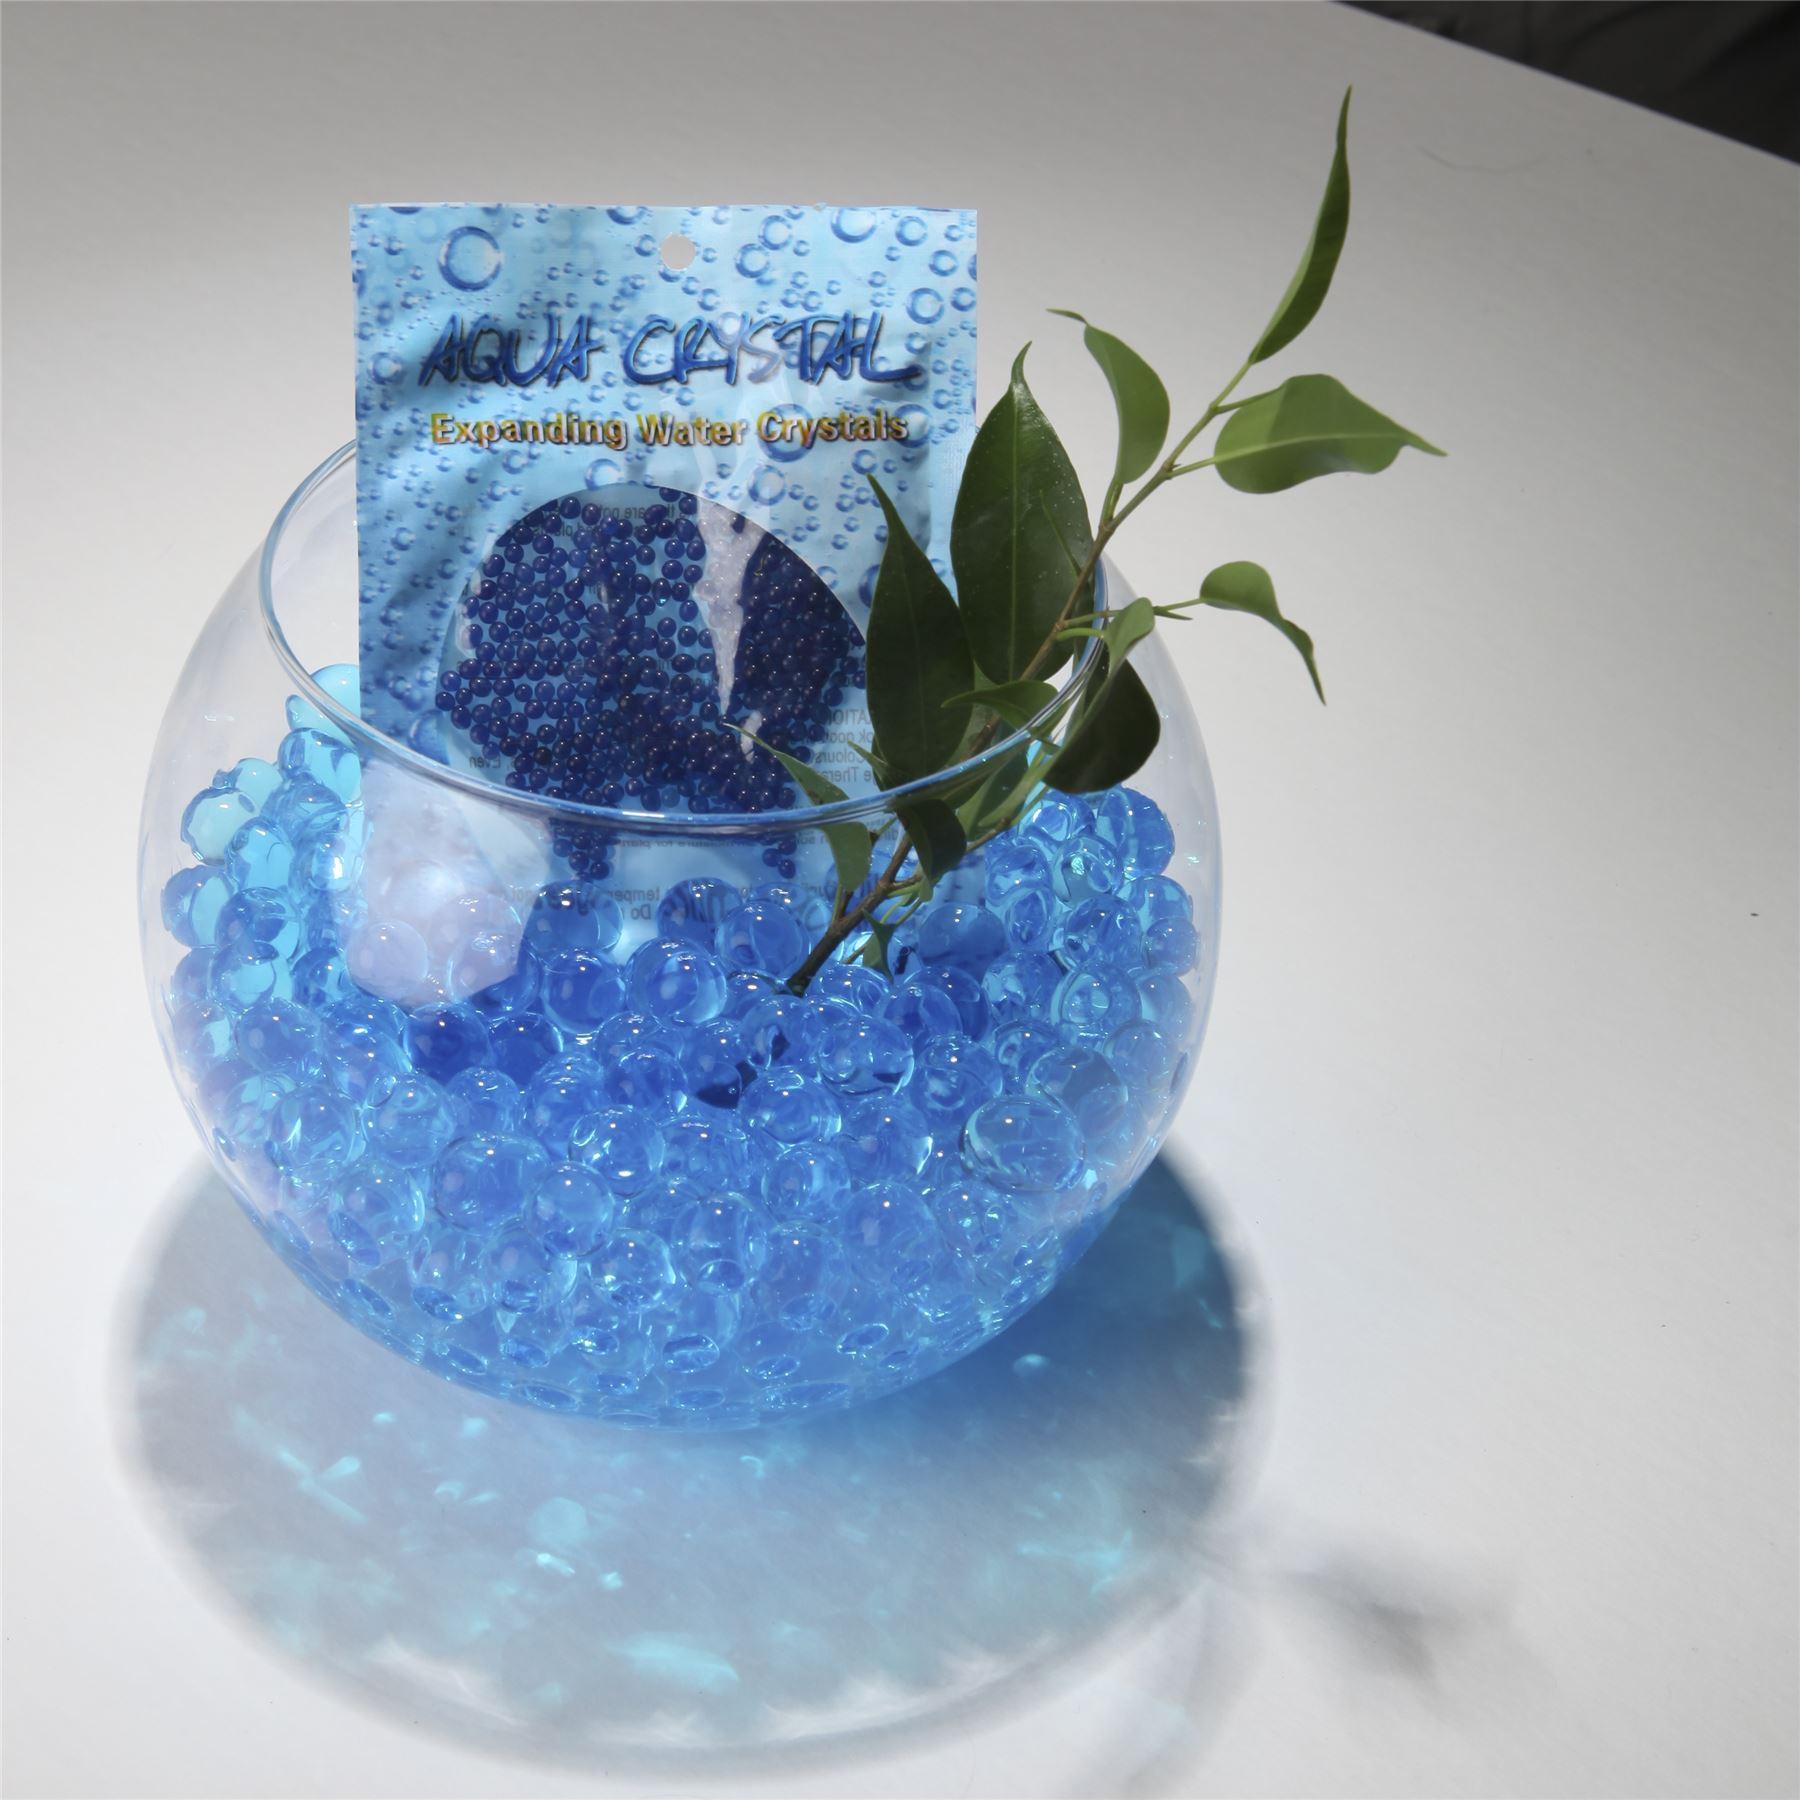 AQUA-CRYSTAL-Expanding-Water-Beads-Bio-Gel-Ball-Florist-Centrepiece-Vase-Filler